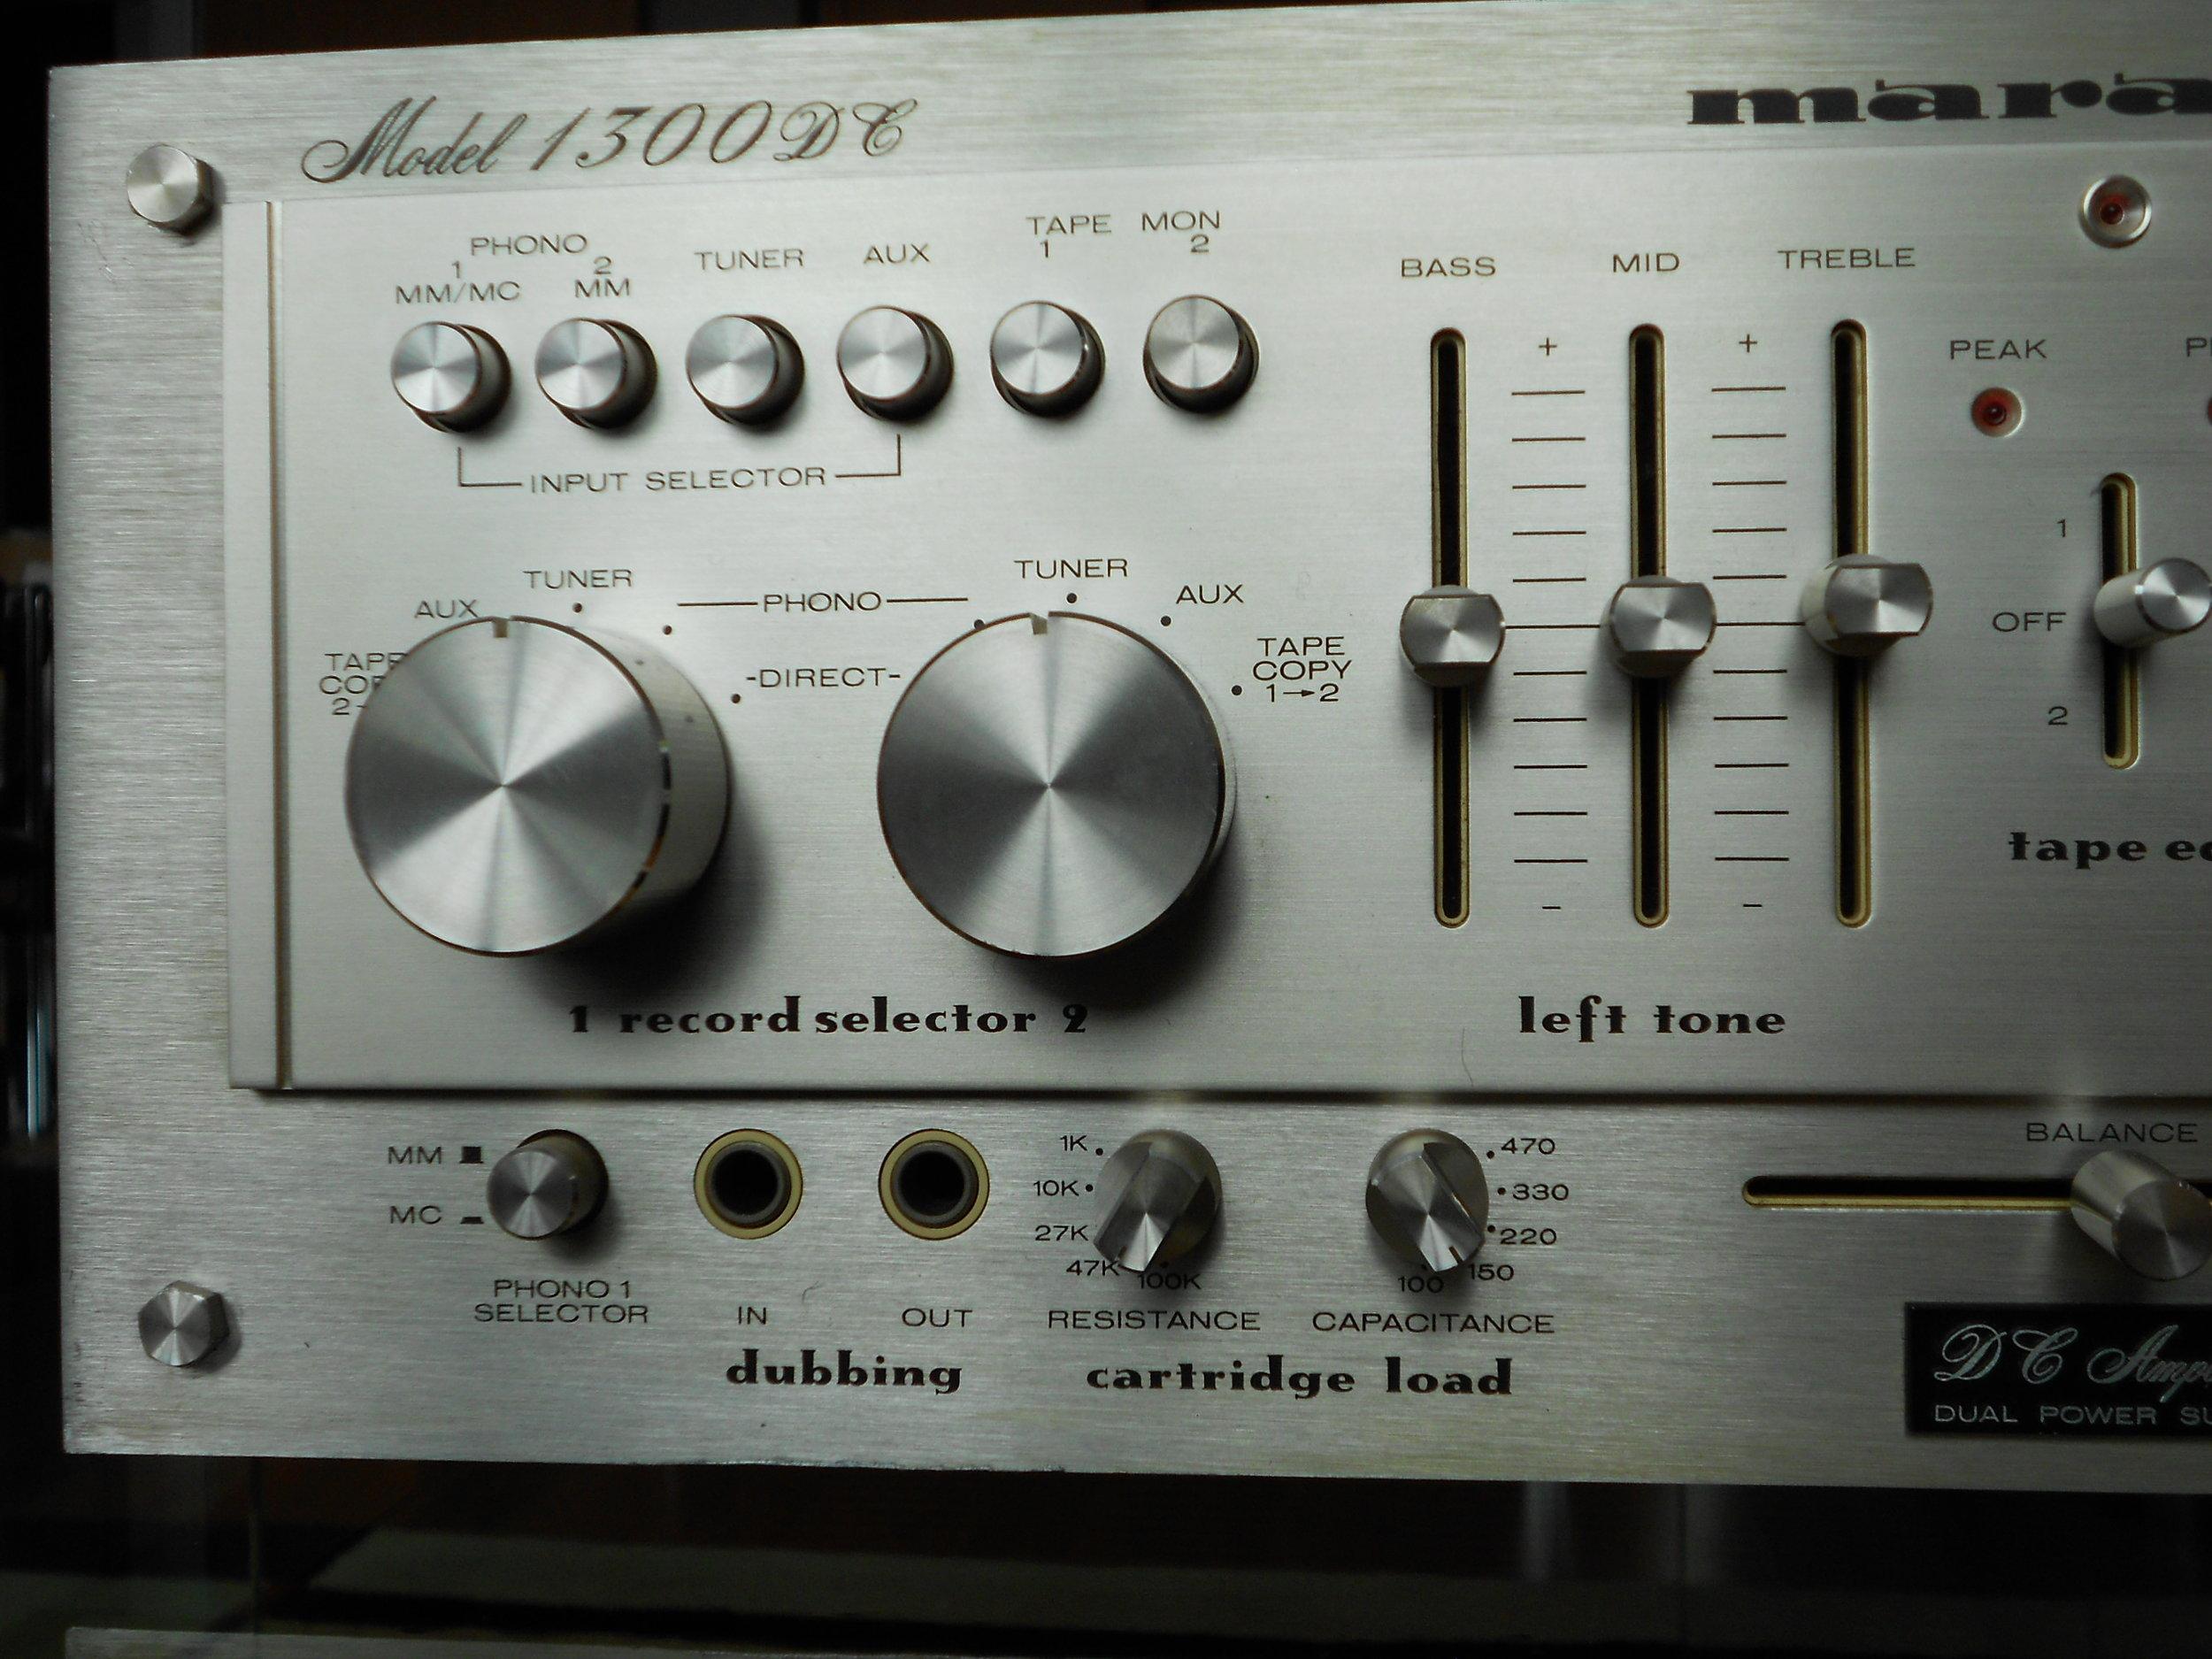 Marantz 1300DC amplifier